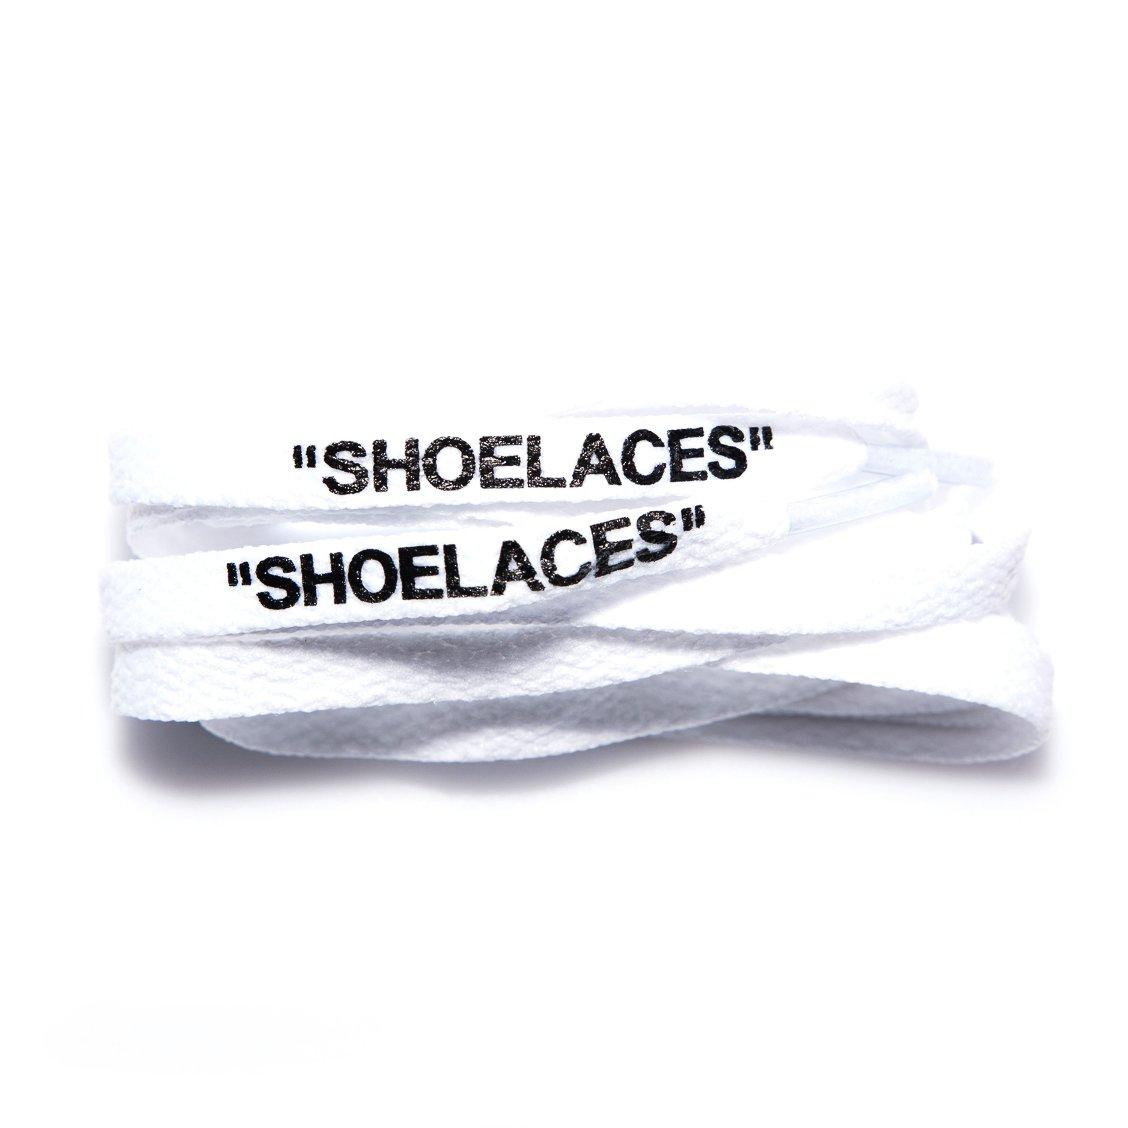 xxiii - ''Shoelaces'' OFF WHITE INSPIRED Replica Shoe Laces Cotton Flat Laces Swap Font Printed Text AJ1 Jordan 1 Air Max